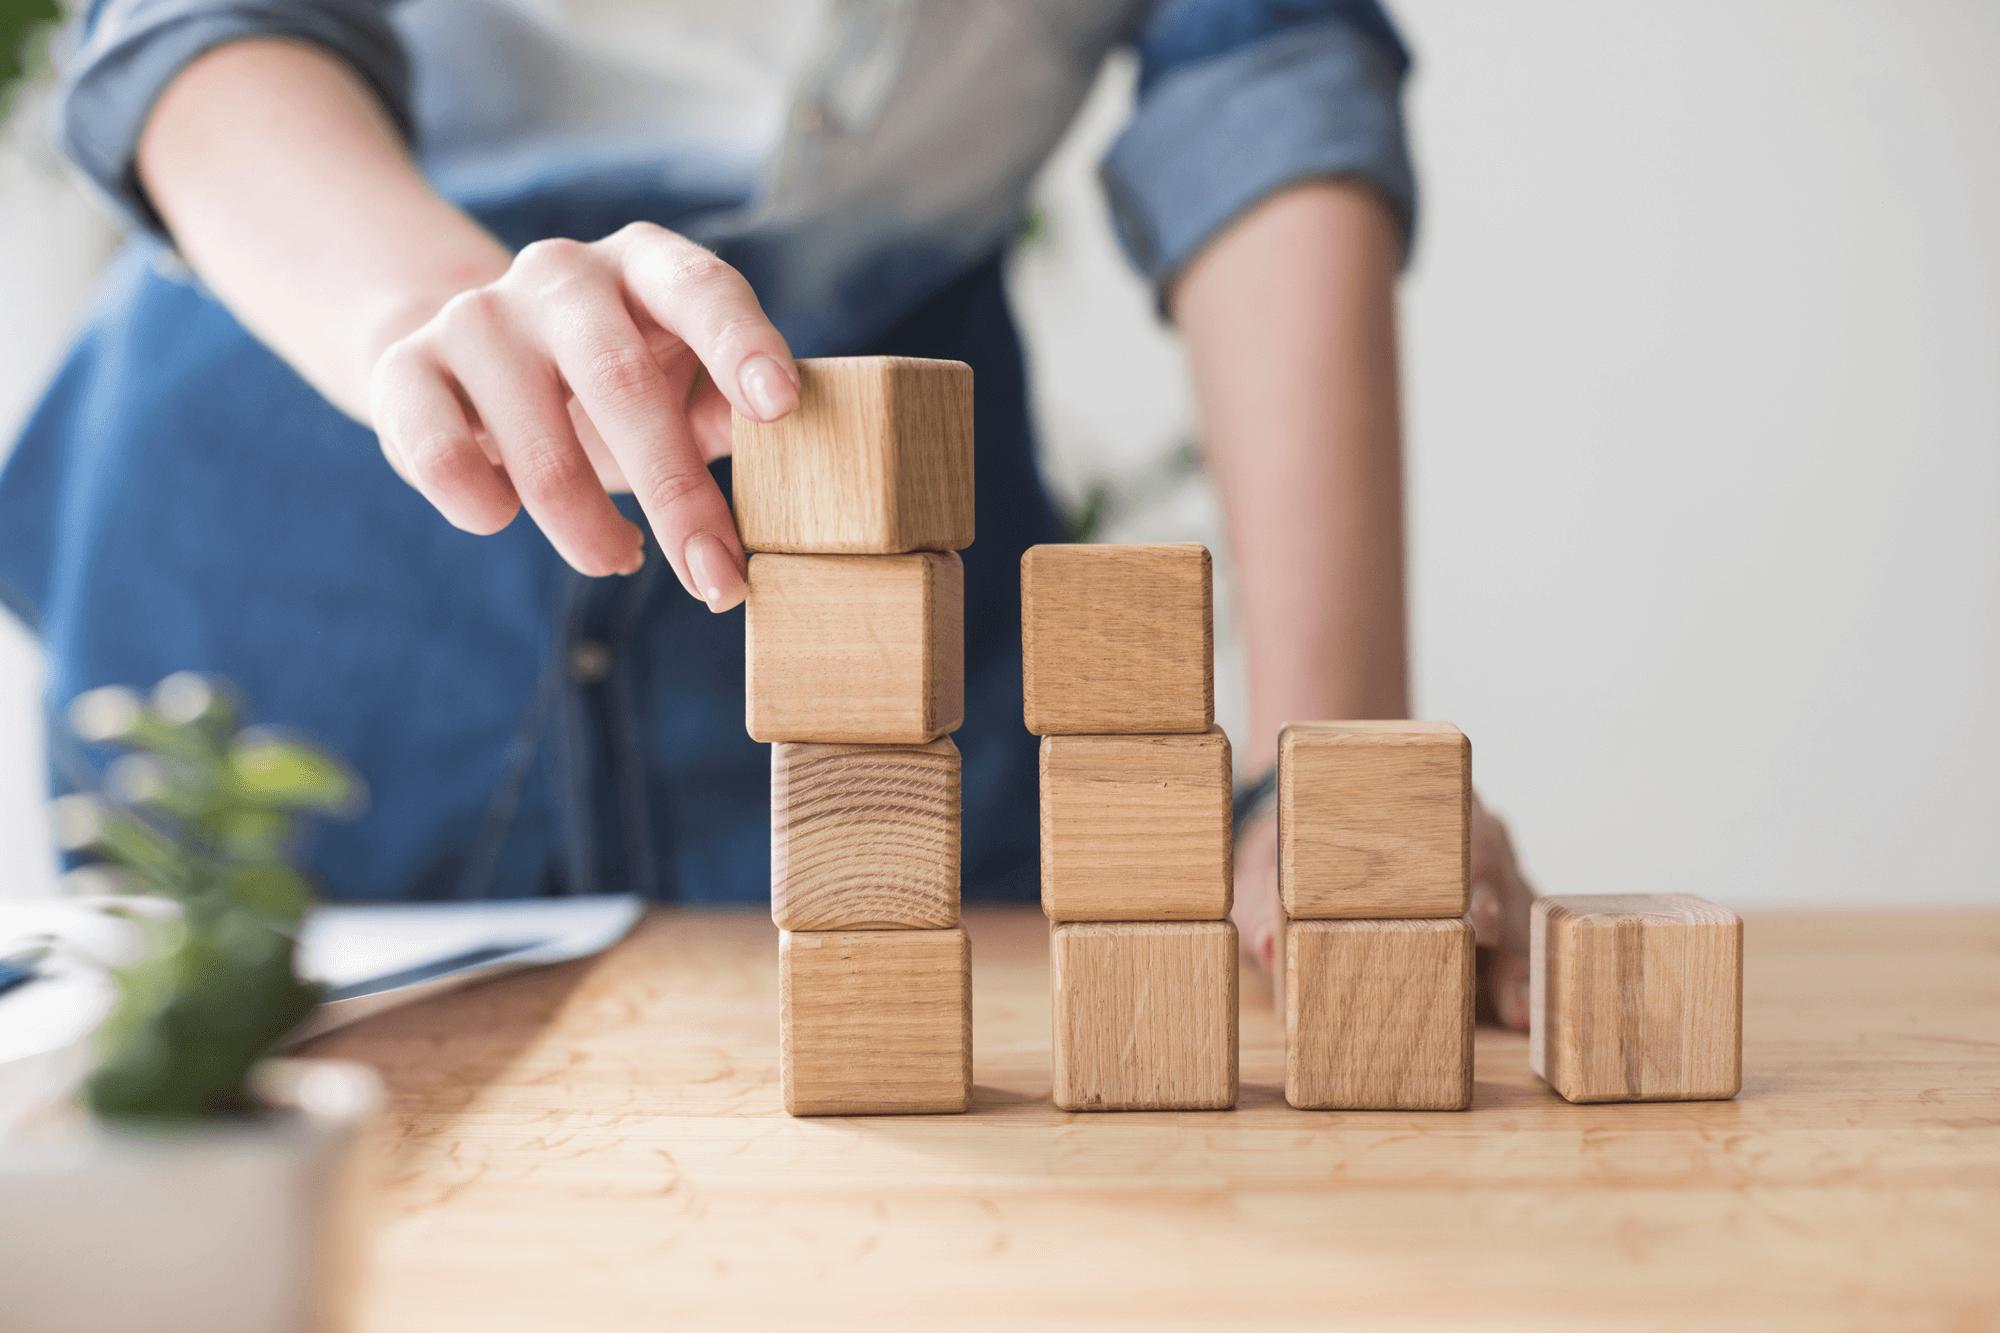 Pivoting organizations | Developing organizations with BI